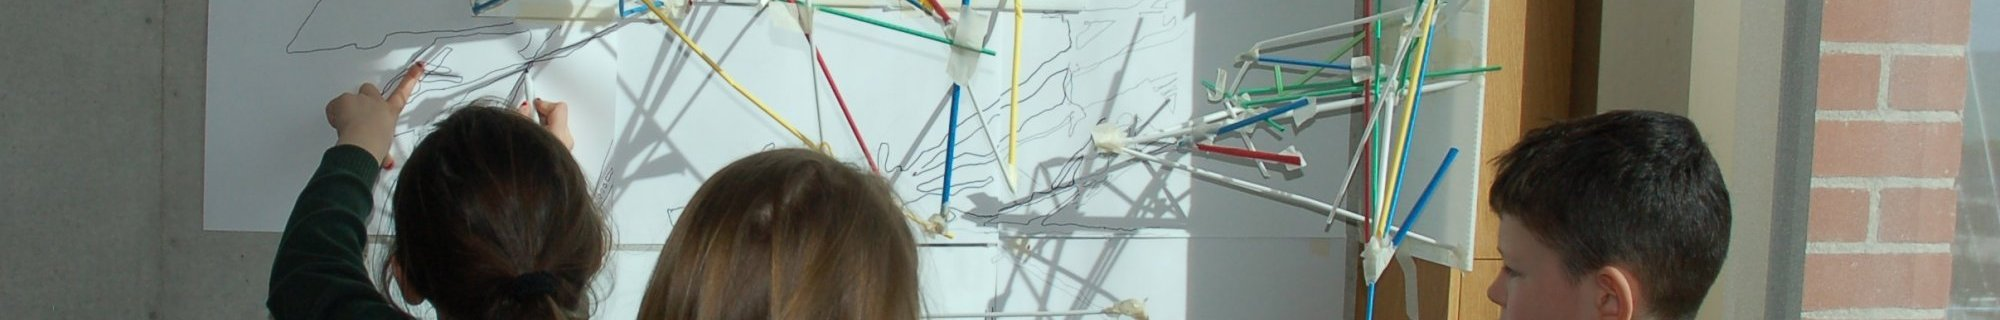 children creating artworks